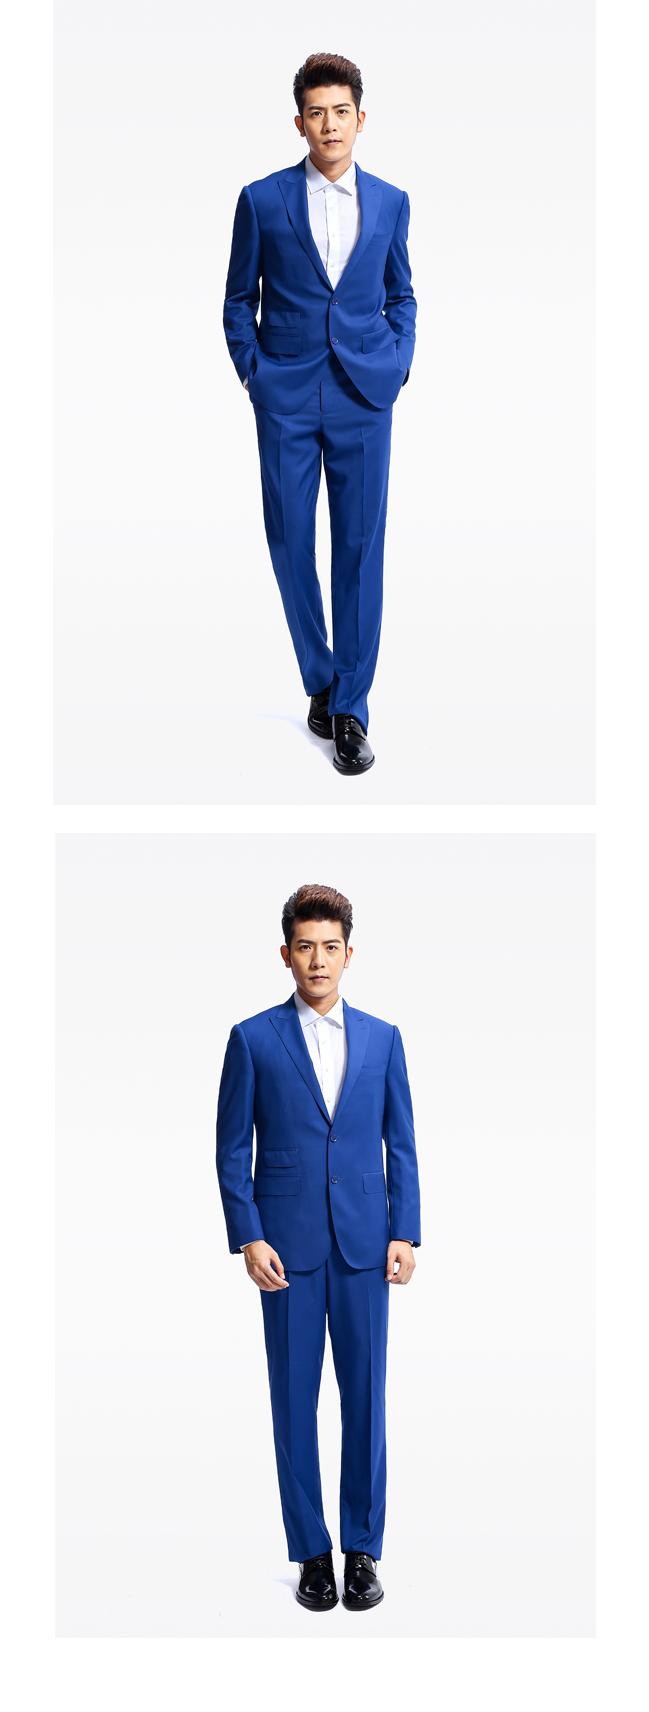 BADIMILAN万博manbetx苹果APP修闲宝蓝色两粒扣戗驳领时尚西装